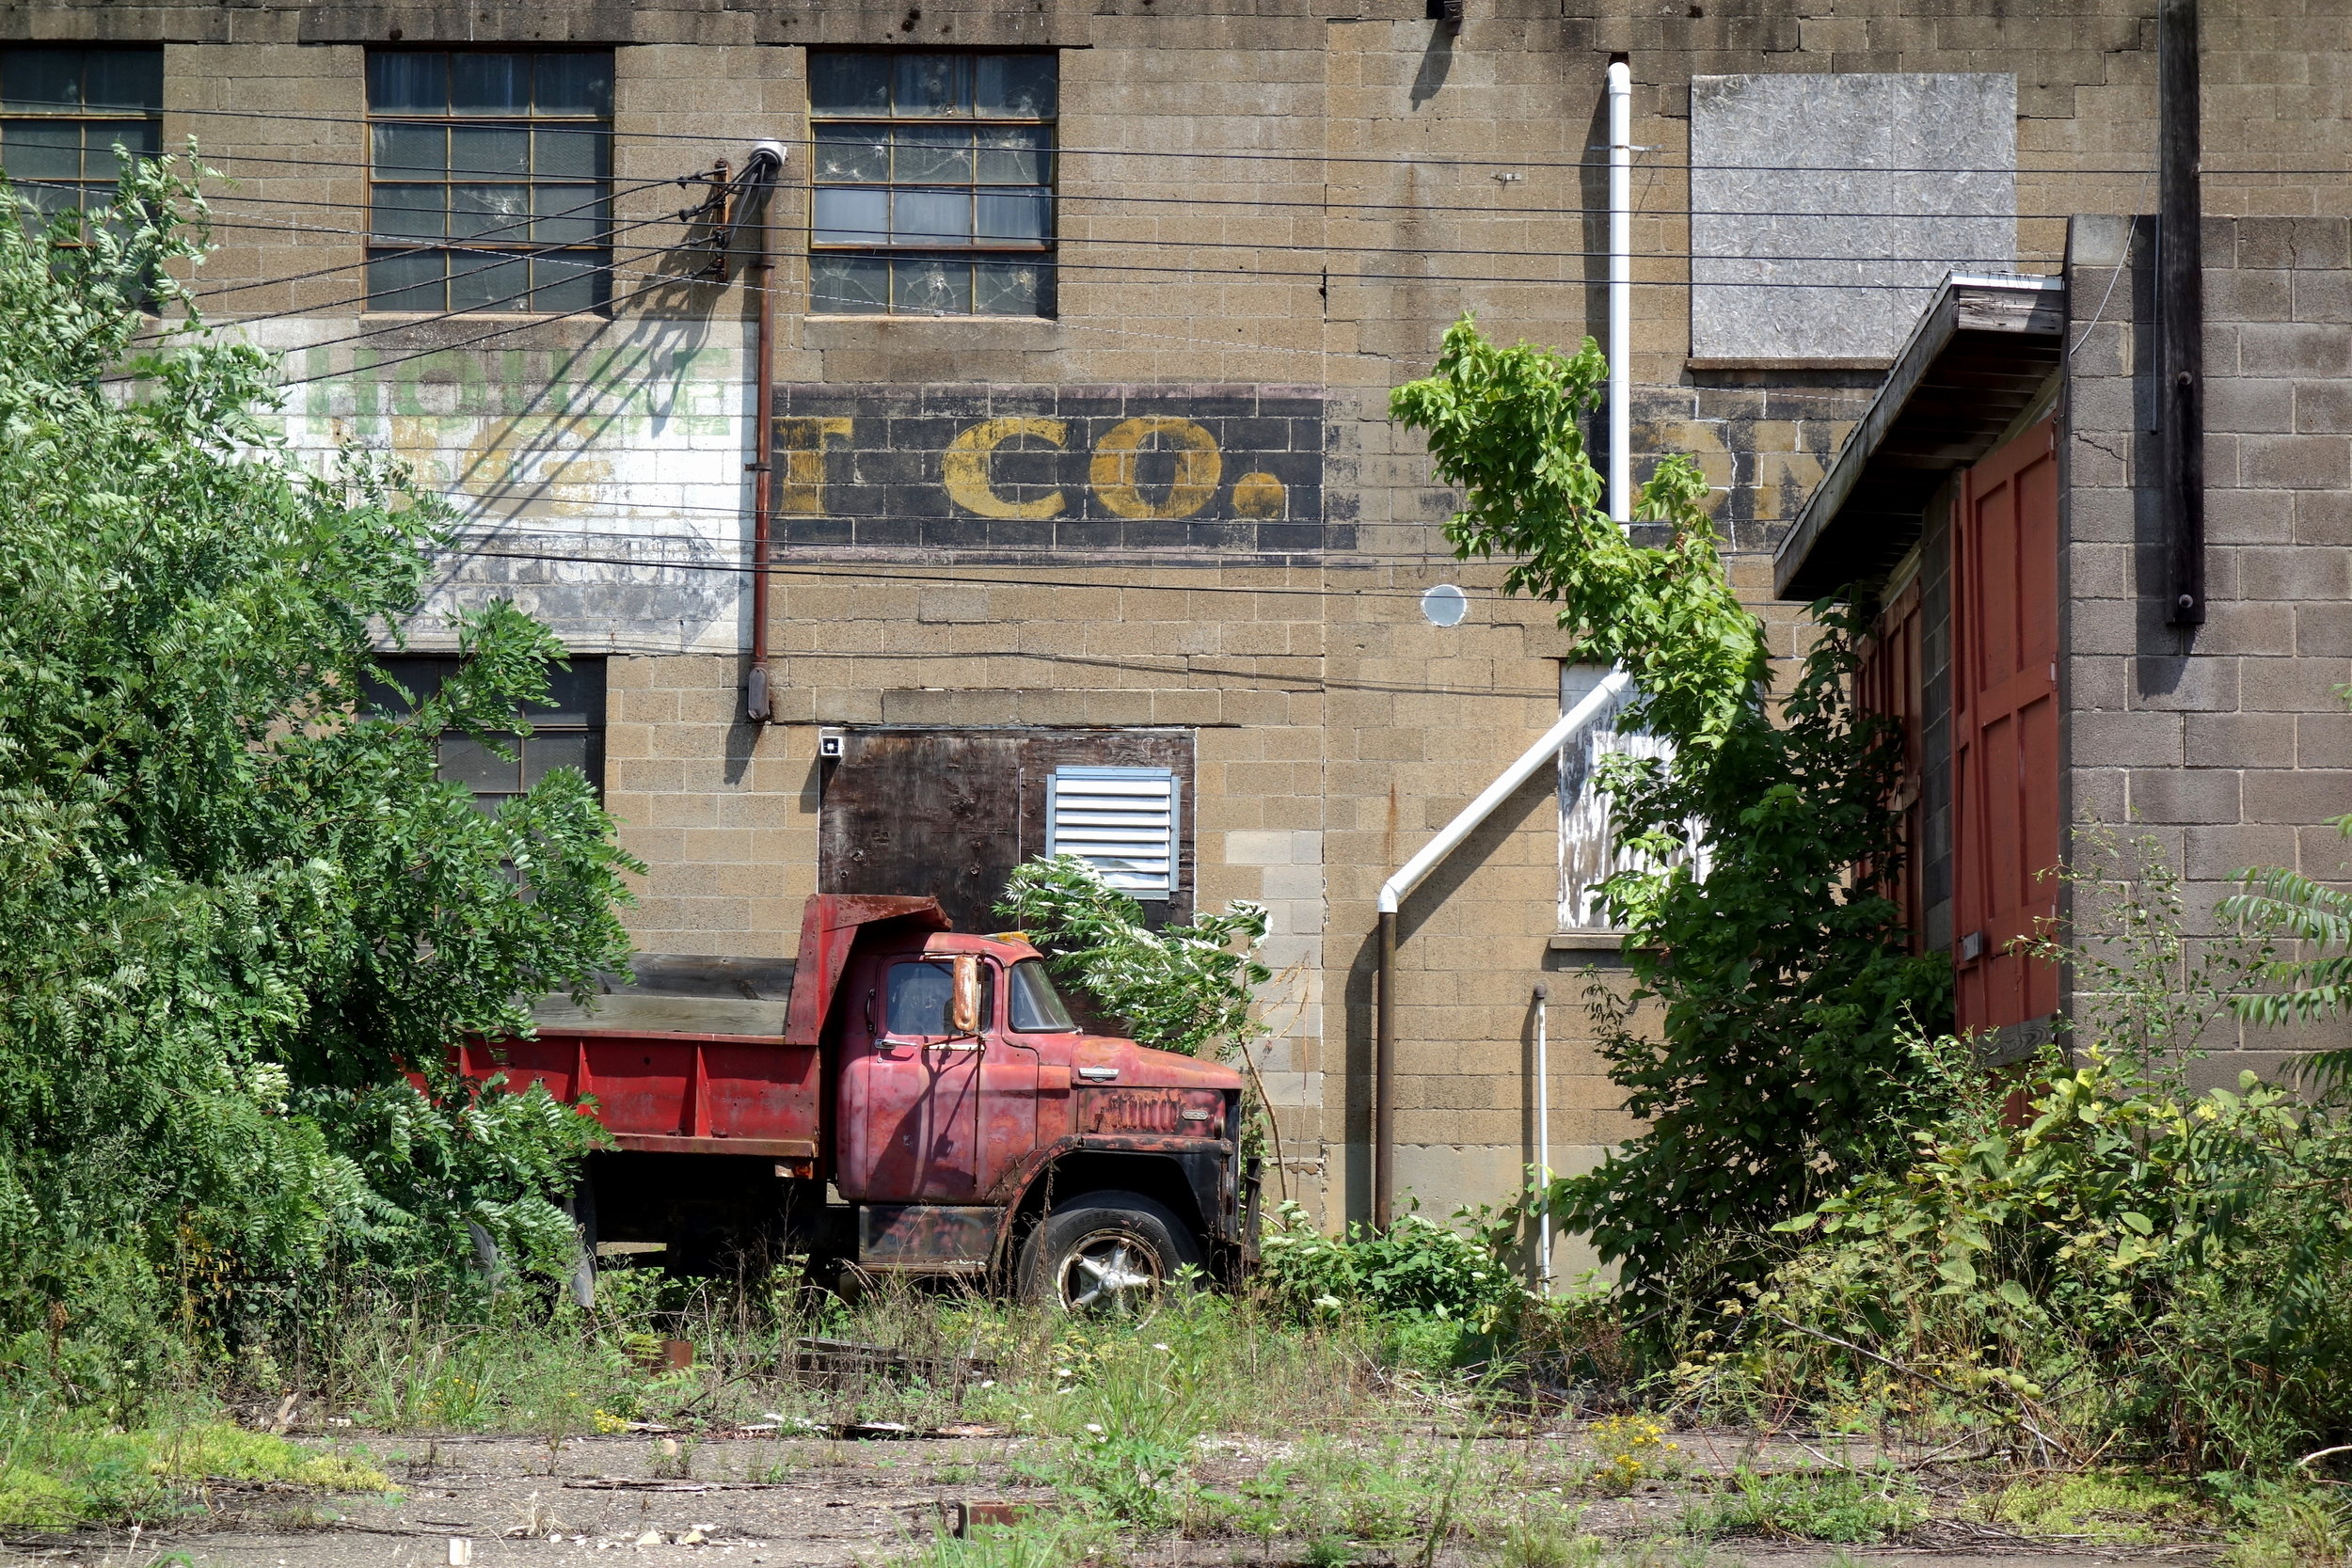 Figure 10. Abandoned facilities of Penn Construction Company, Wheeling, 2016. Photograph by Joseph Heathcott.